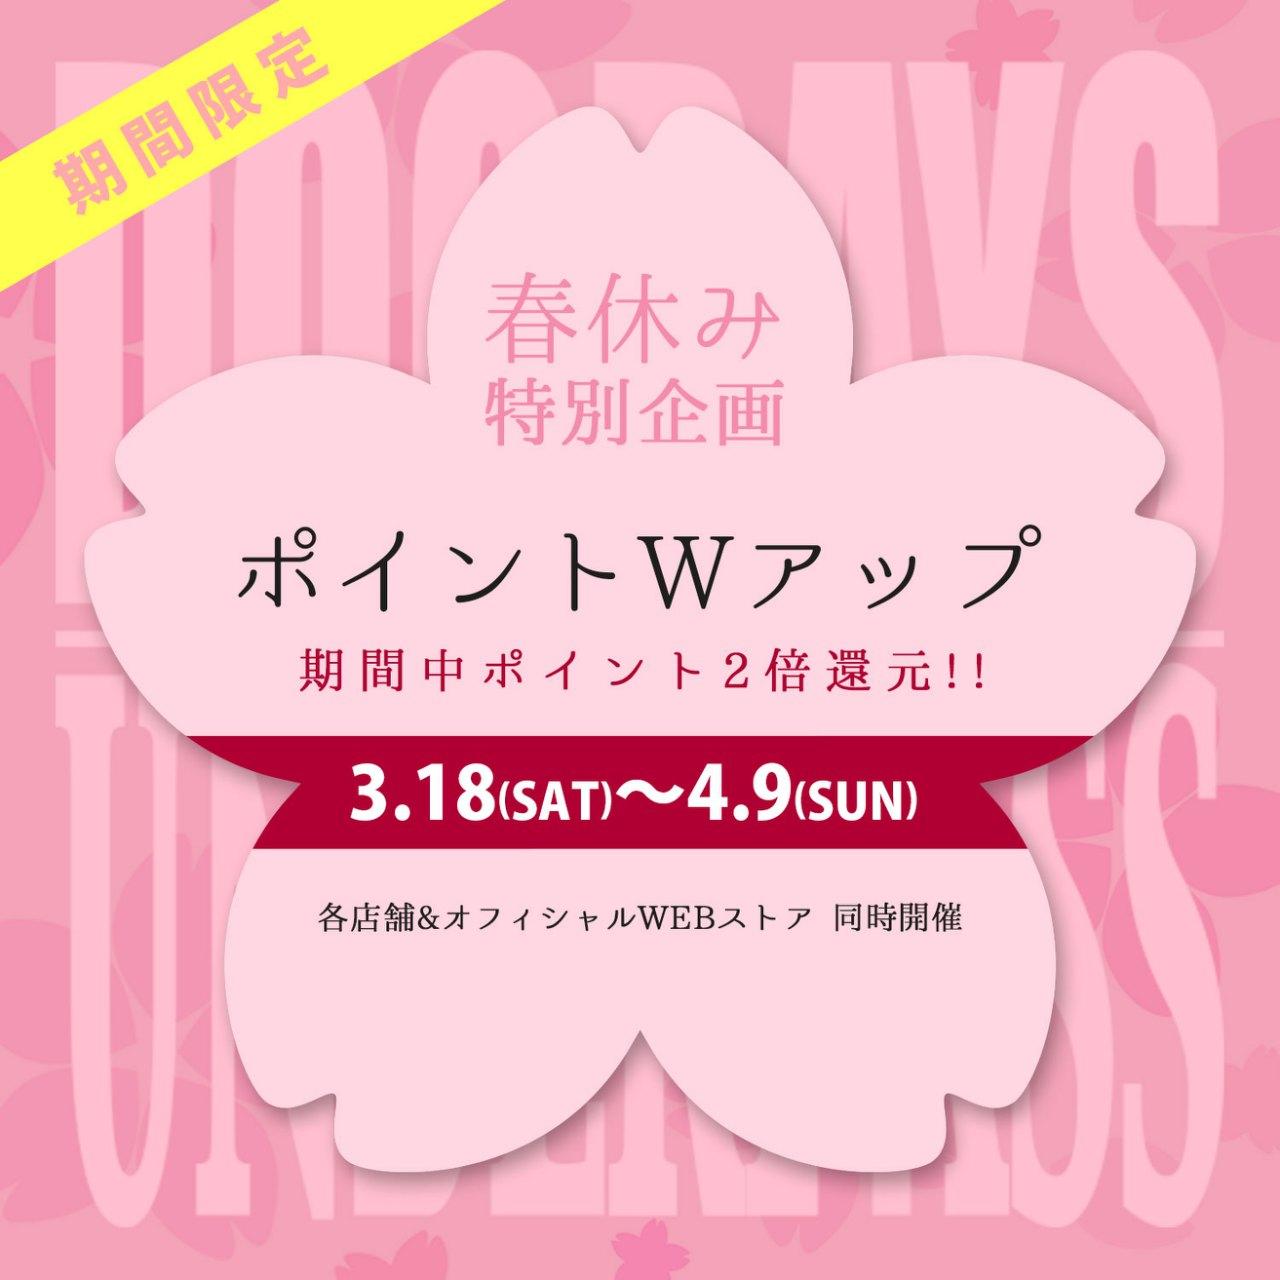 CONVERSE TOKYO - Collaboration Line._f0020773_2231489.jpg